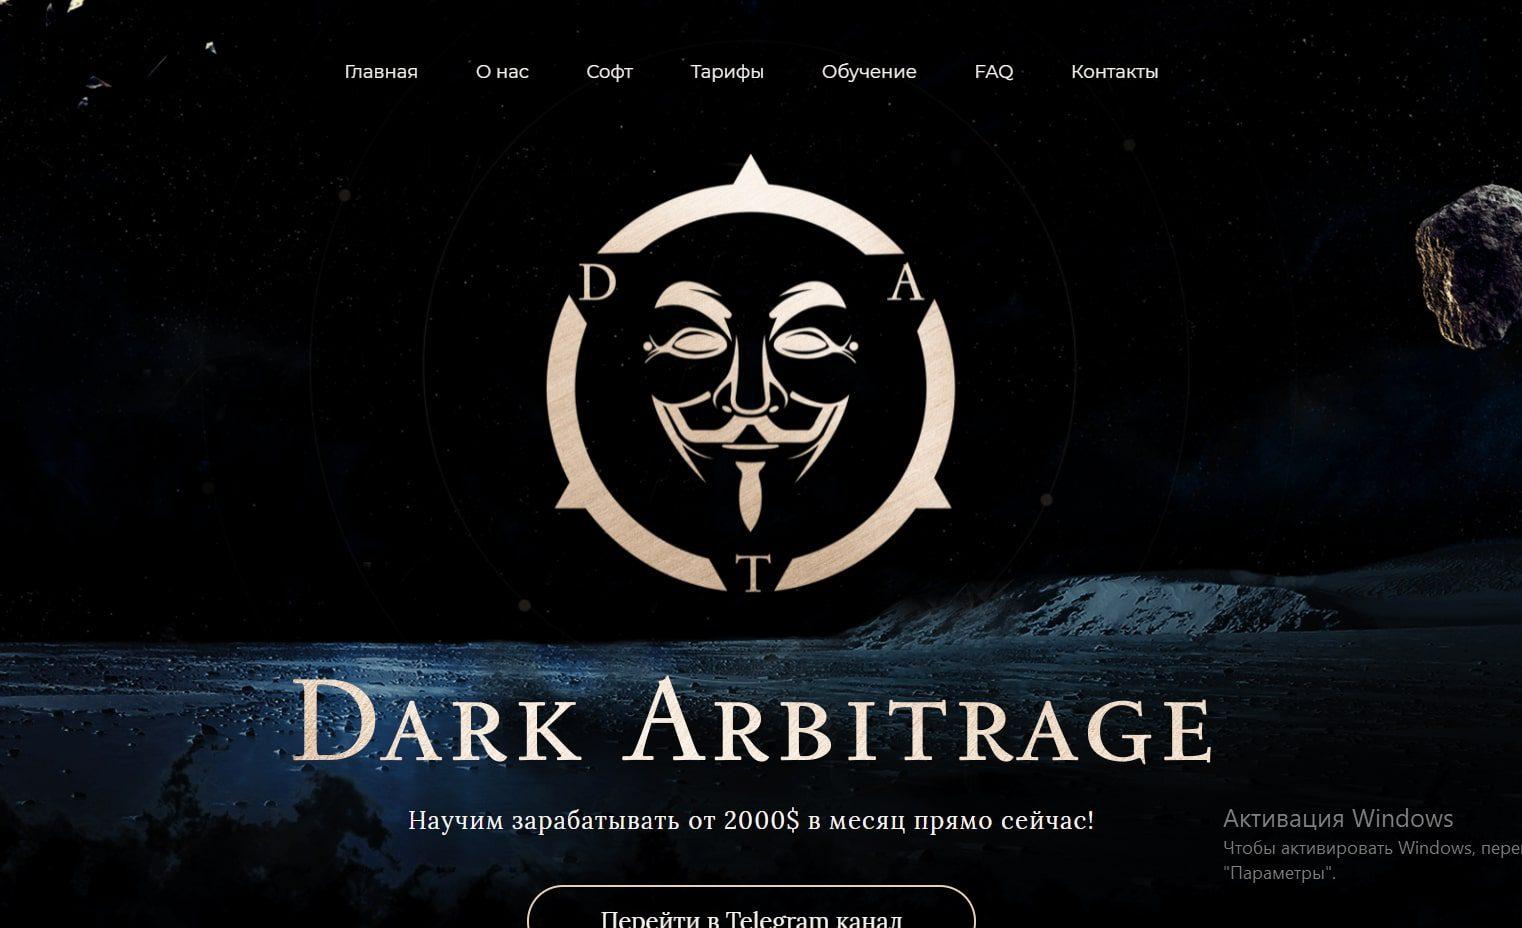 Dark Arbitrage - сайт